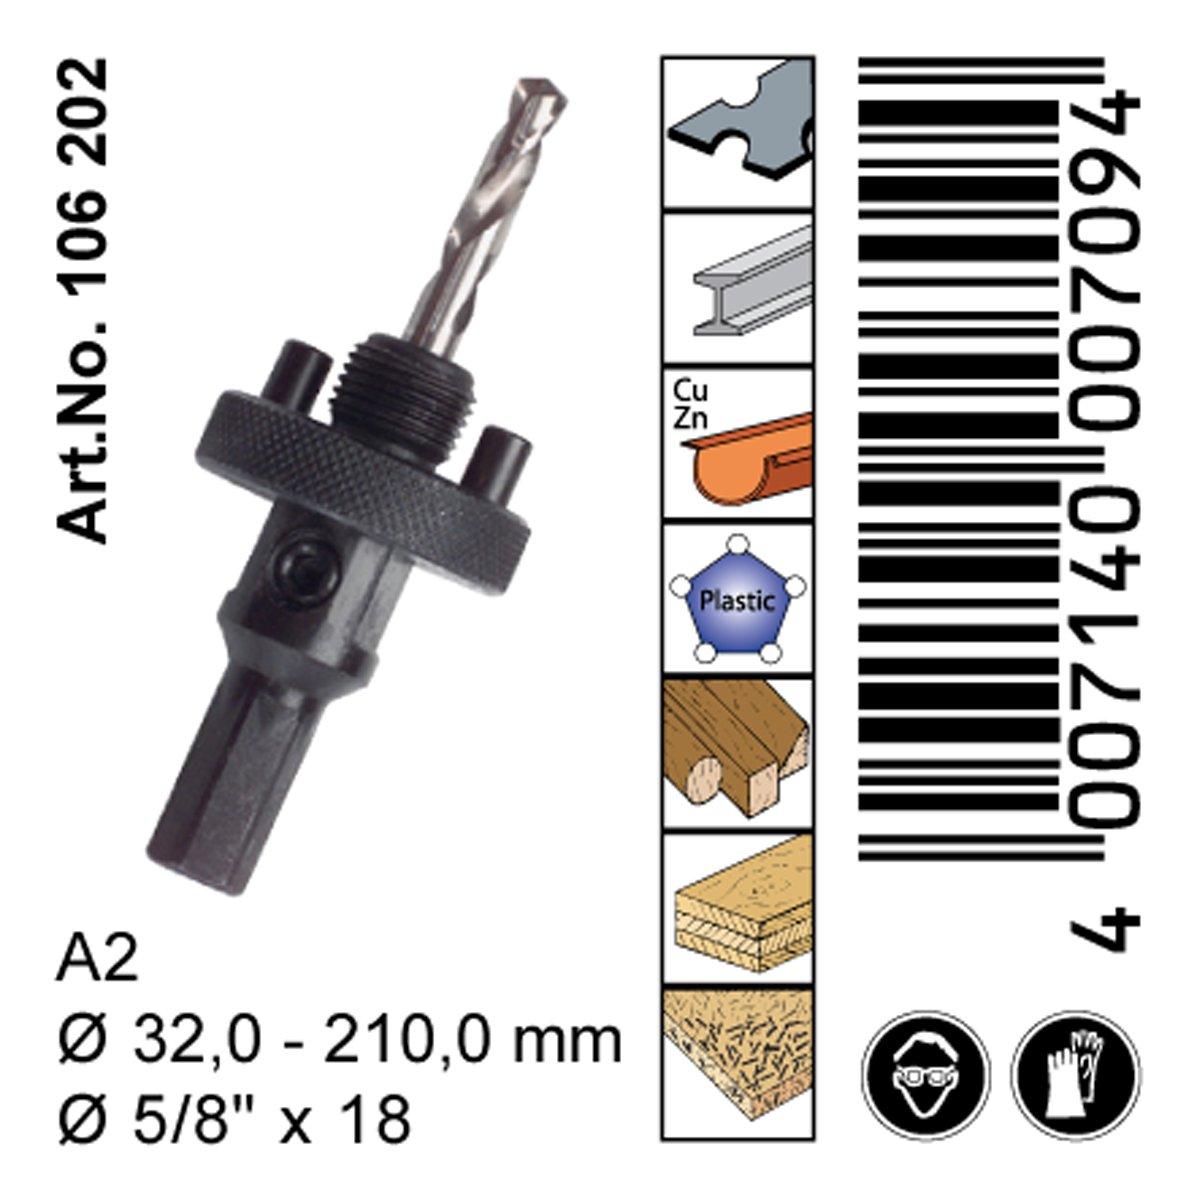 Aufnahmehalter inkl HSS Bohrer A2 = 32-210 mm